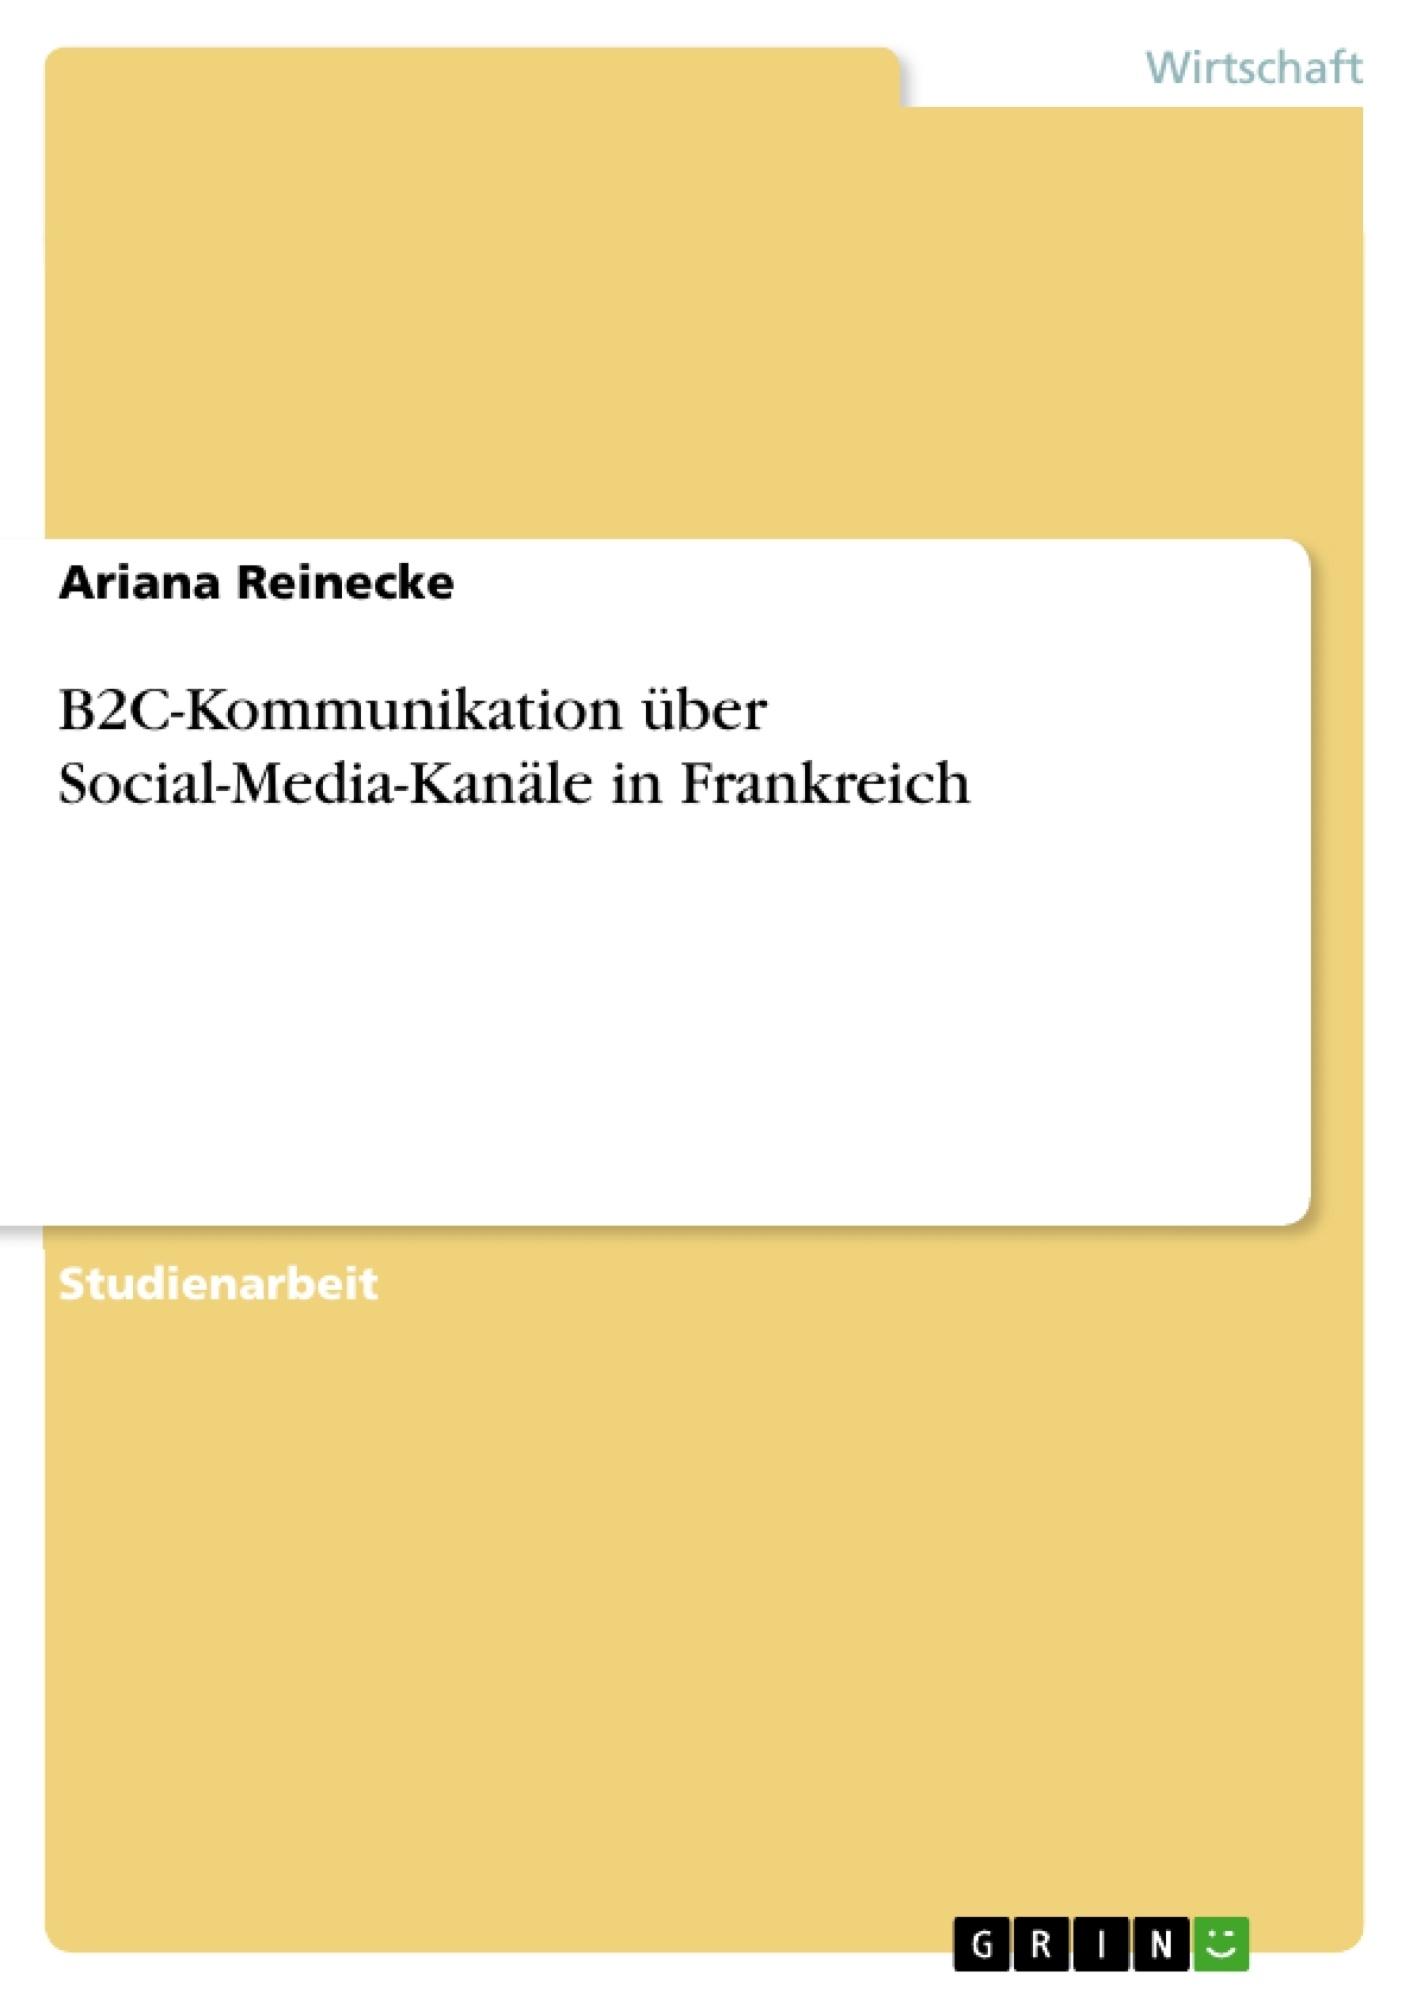 Titel: B2C-Kommunikation über Social-Media-Kanäle in Frankreich